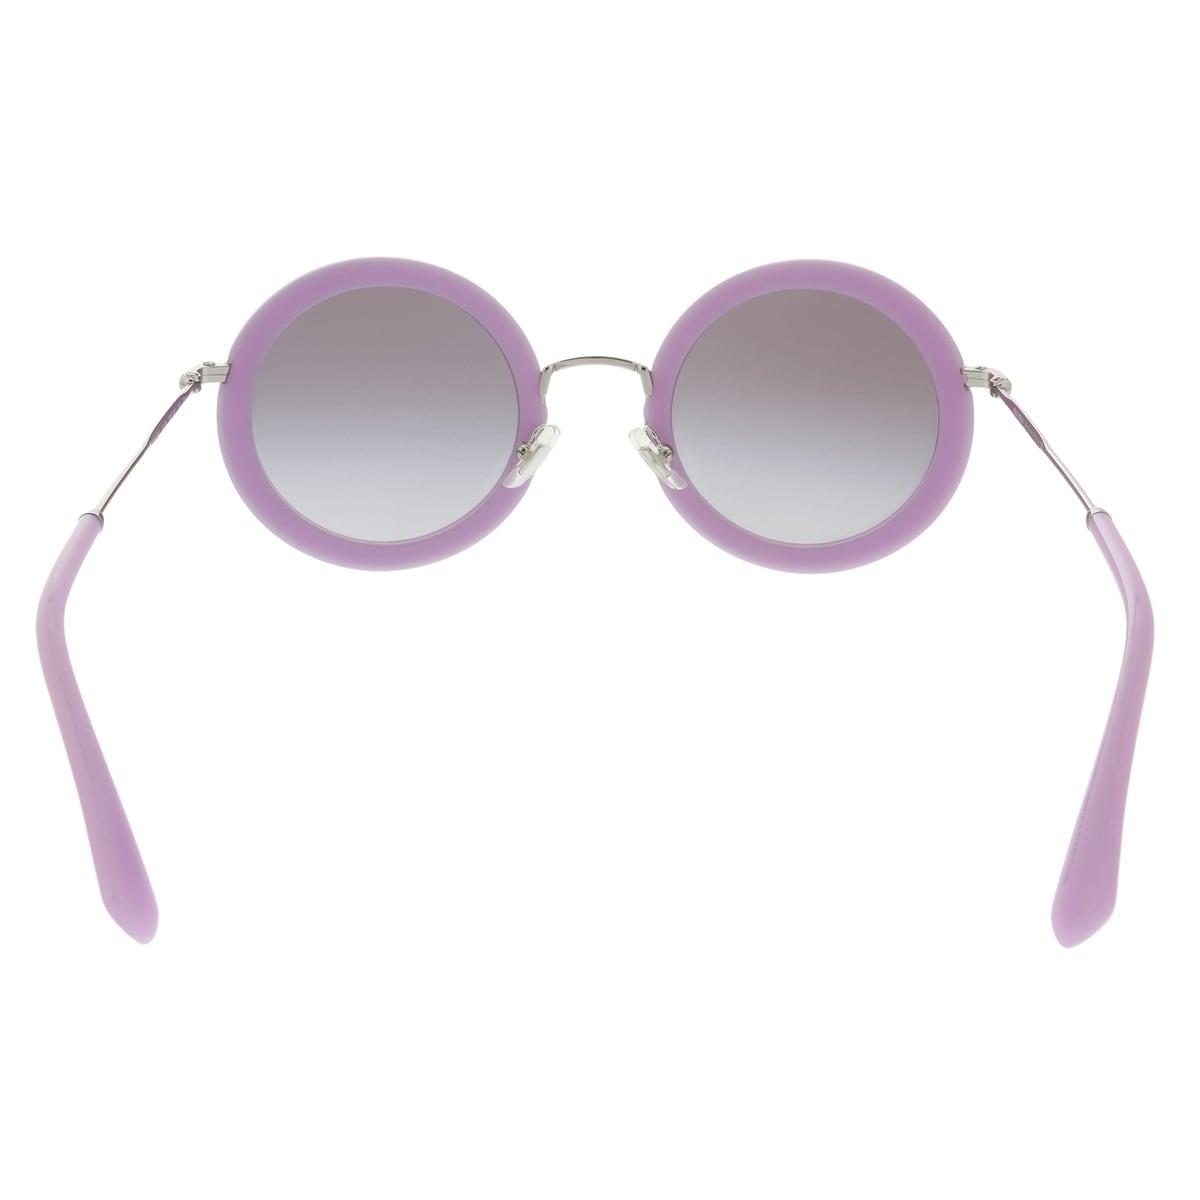 d3d6054d97656 Shop Miu Miu MU 59US 136300 Opal Lilac Round Sunglasses - 48-26-140 - Free  Shipping Today - Overstock - 27793659